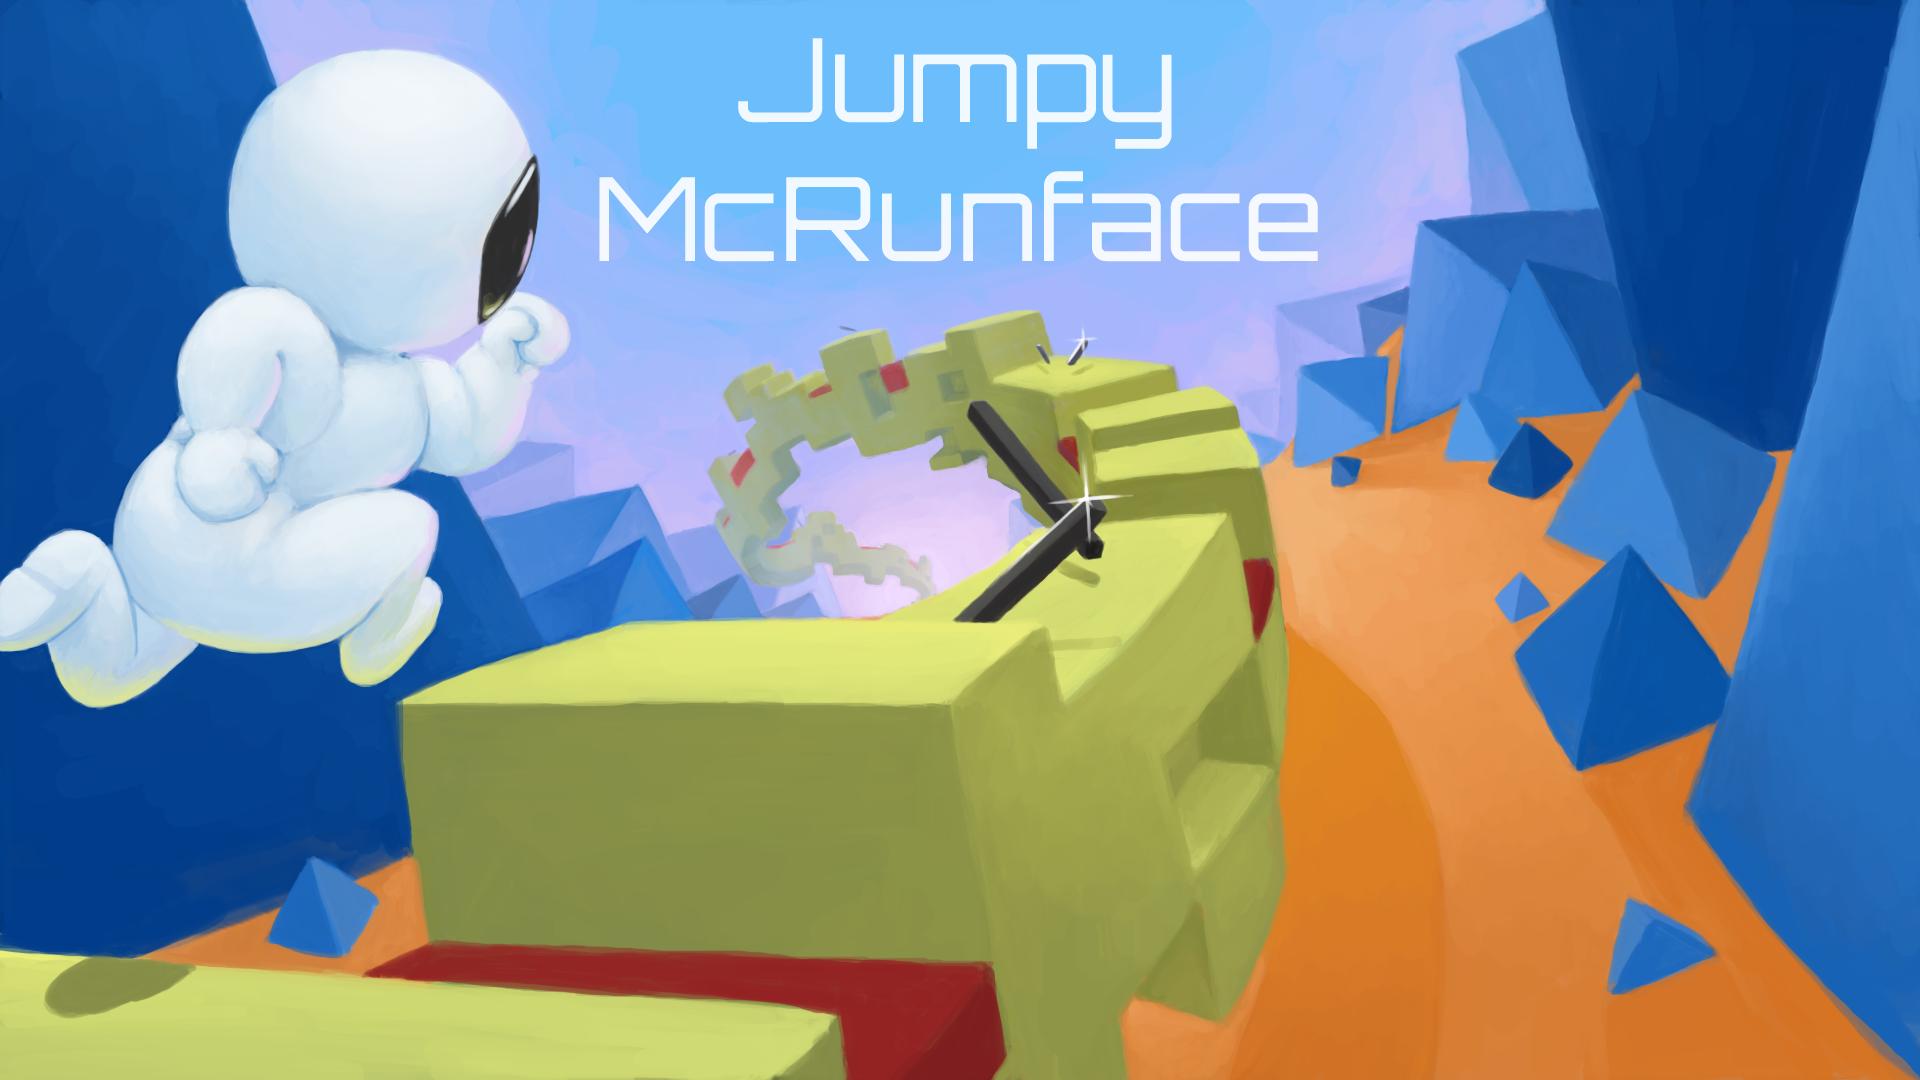 Jumpy McRunface